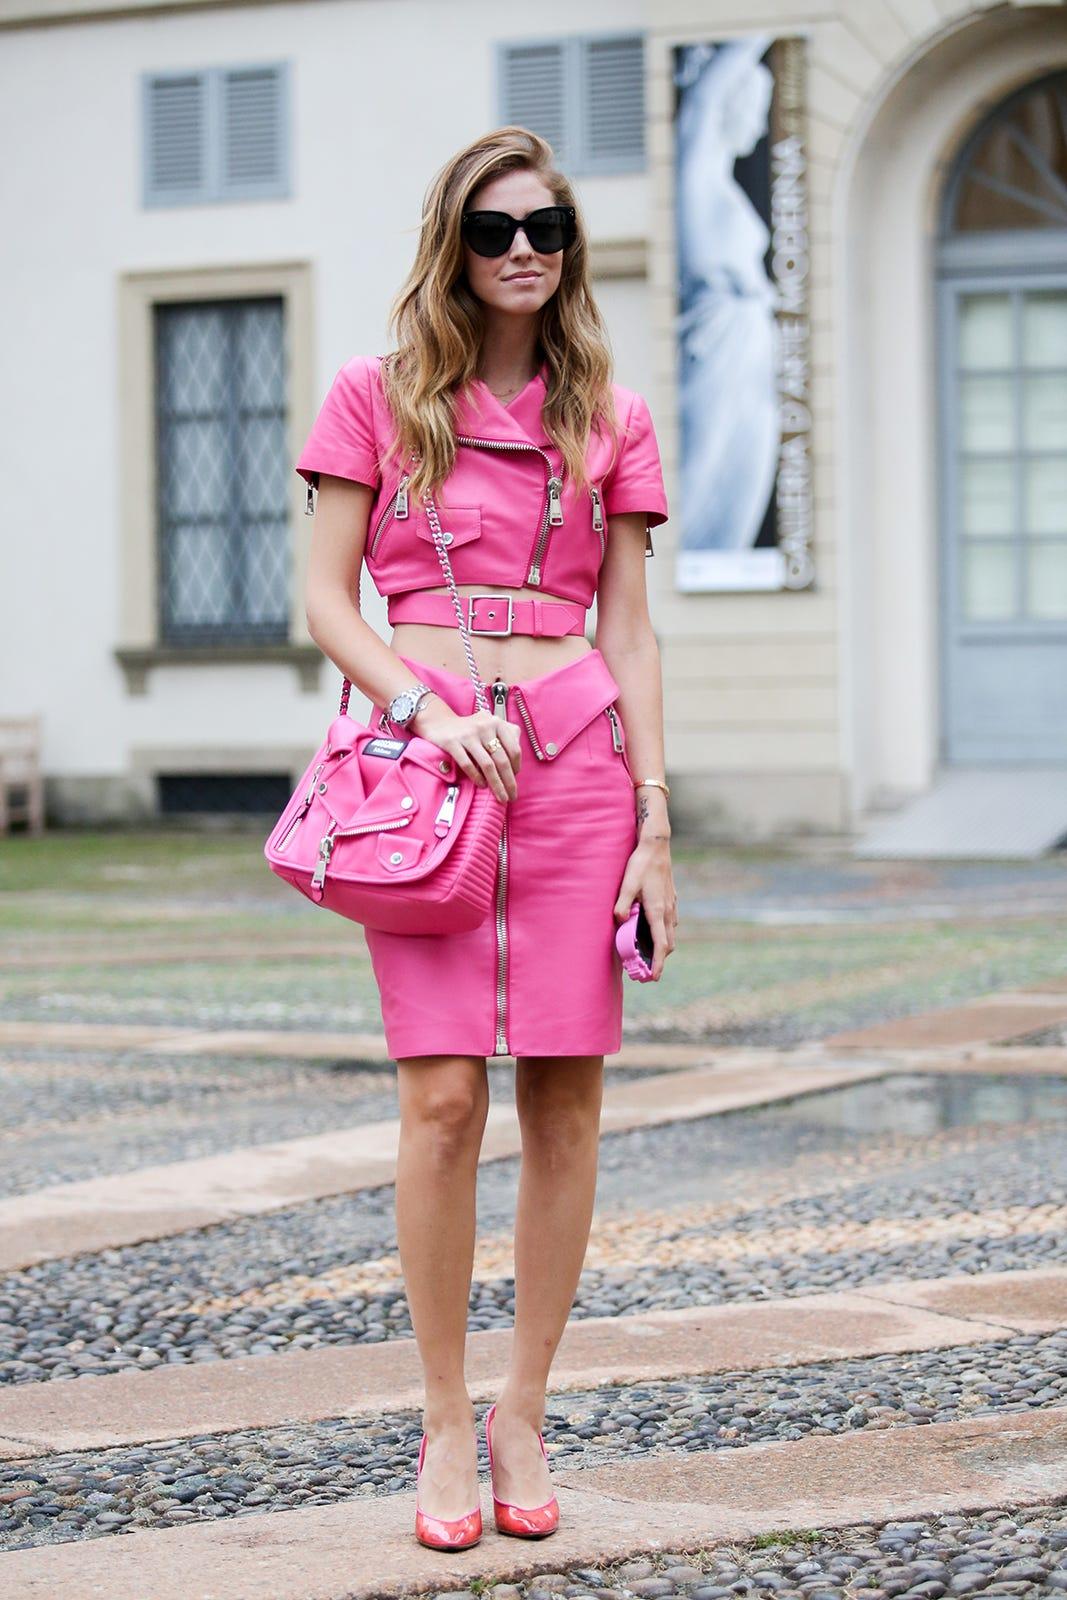 Milan Street Style - Italian Fashion | 1067 x 1600 jpeg 225kB